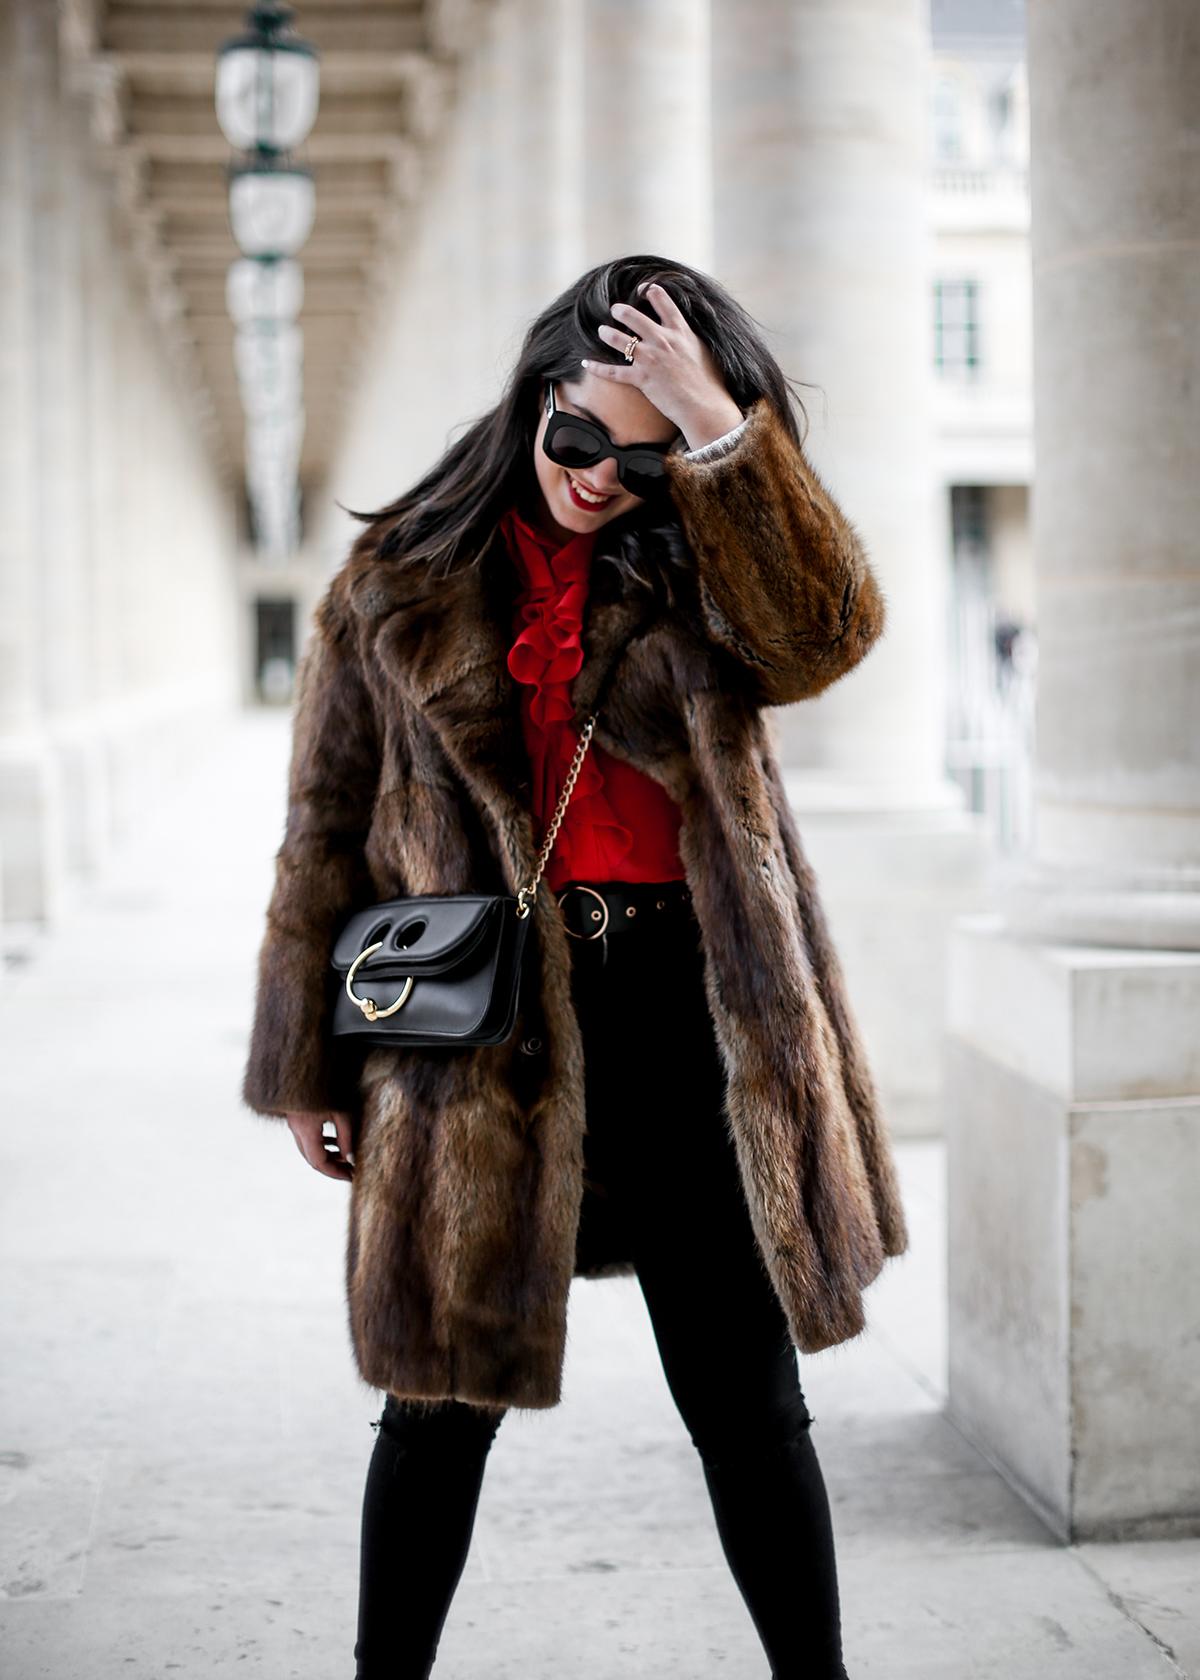 camisa-roja-volantes-pipa-de-la-paz-abrigo-pelo-vintage-look-studded-boots-myblueberrynightsblog8